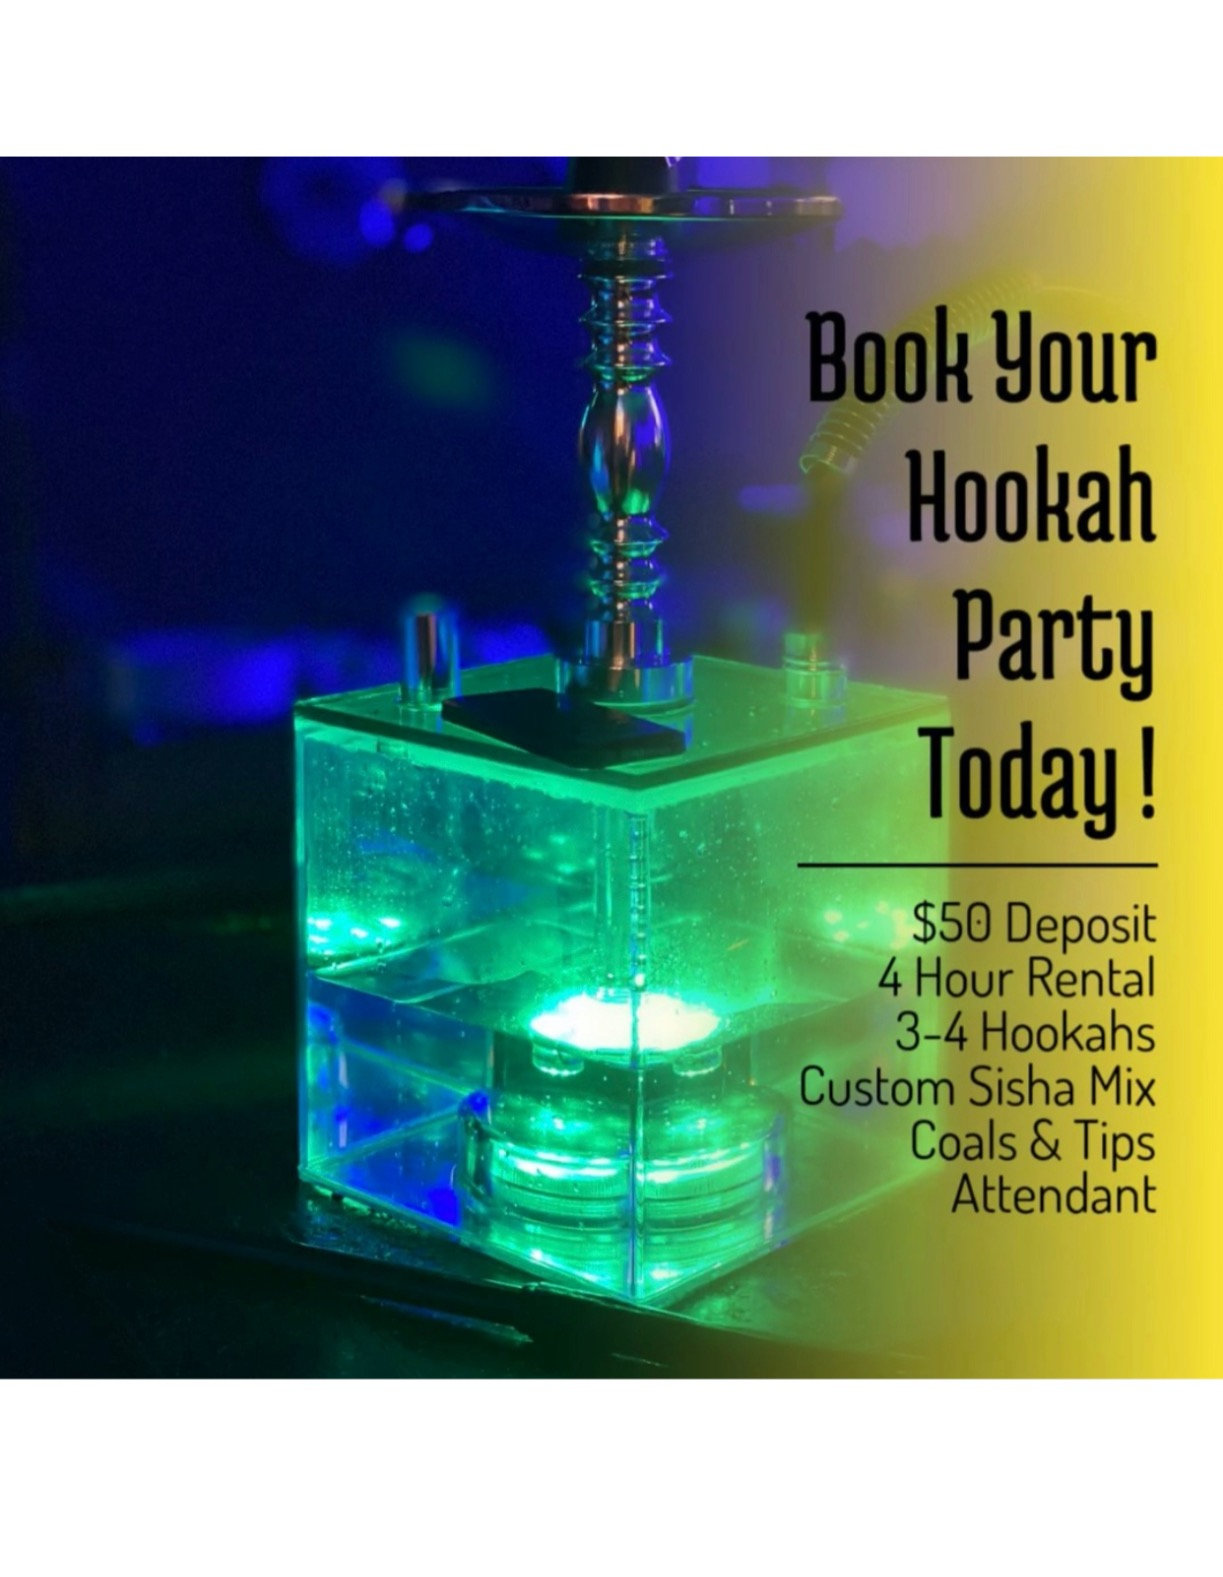 Hookah Party Deposit